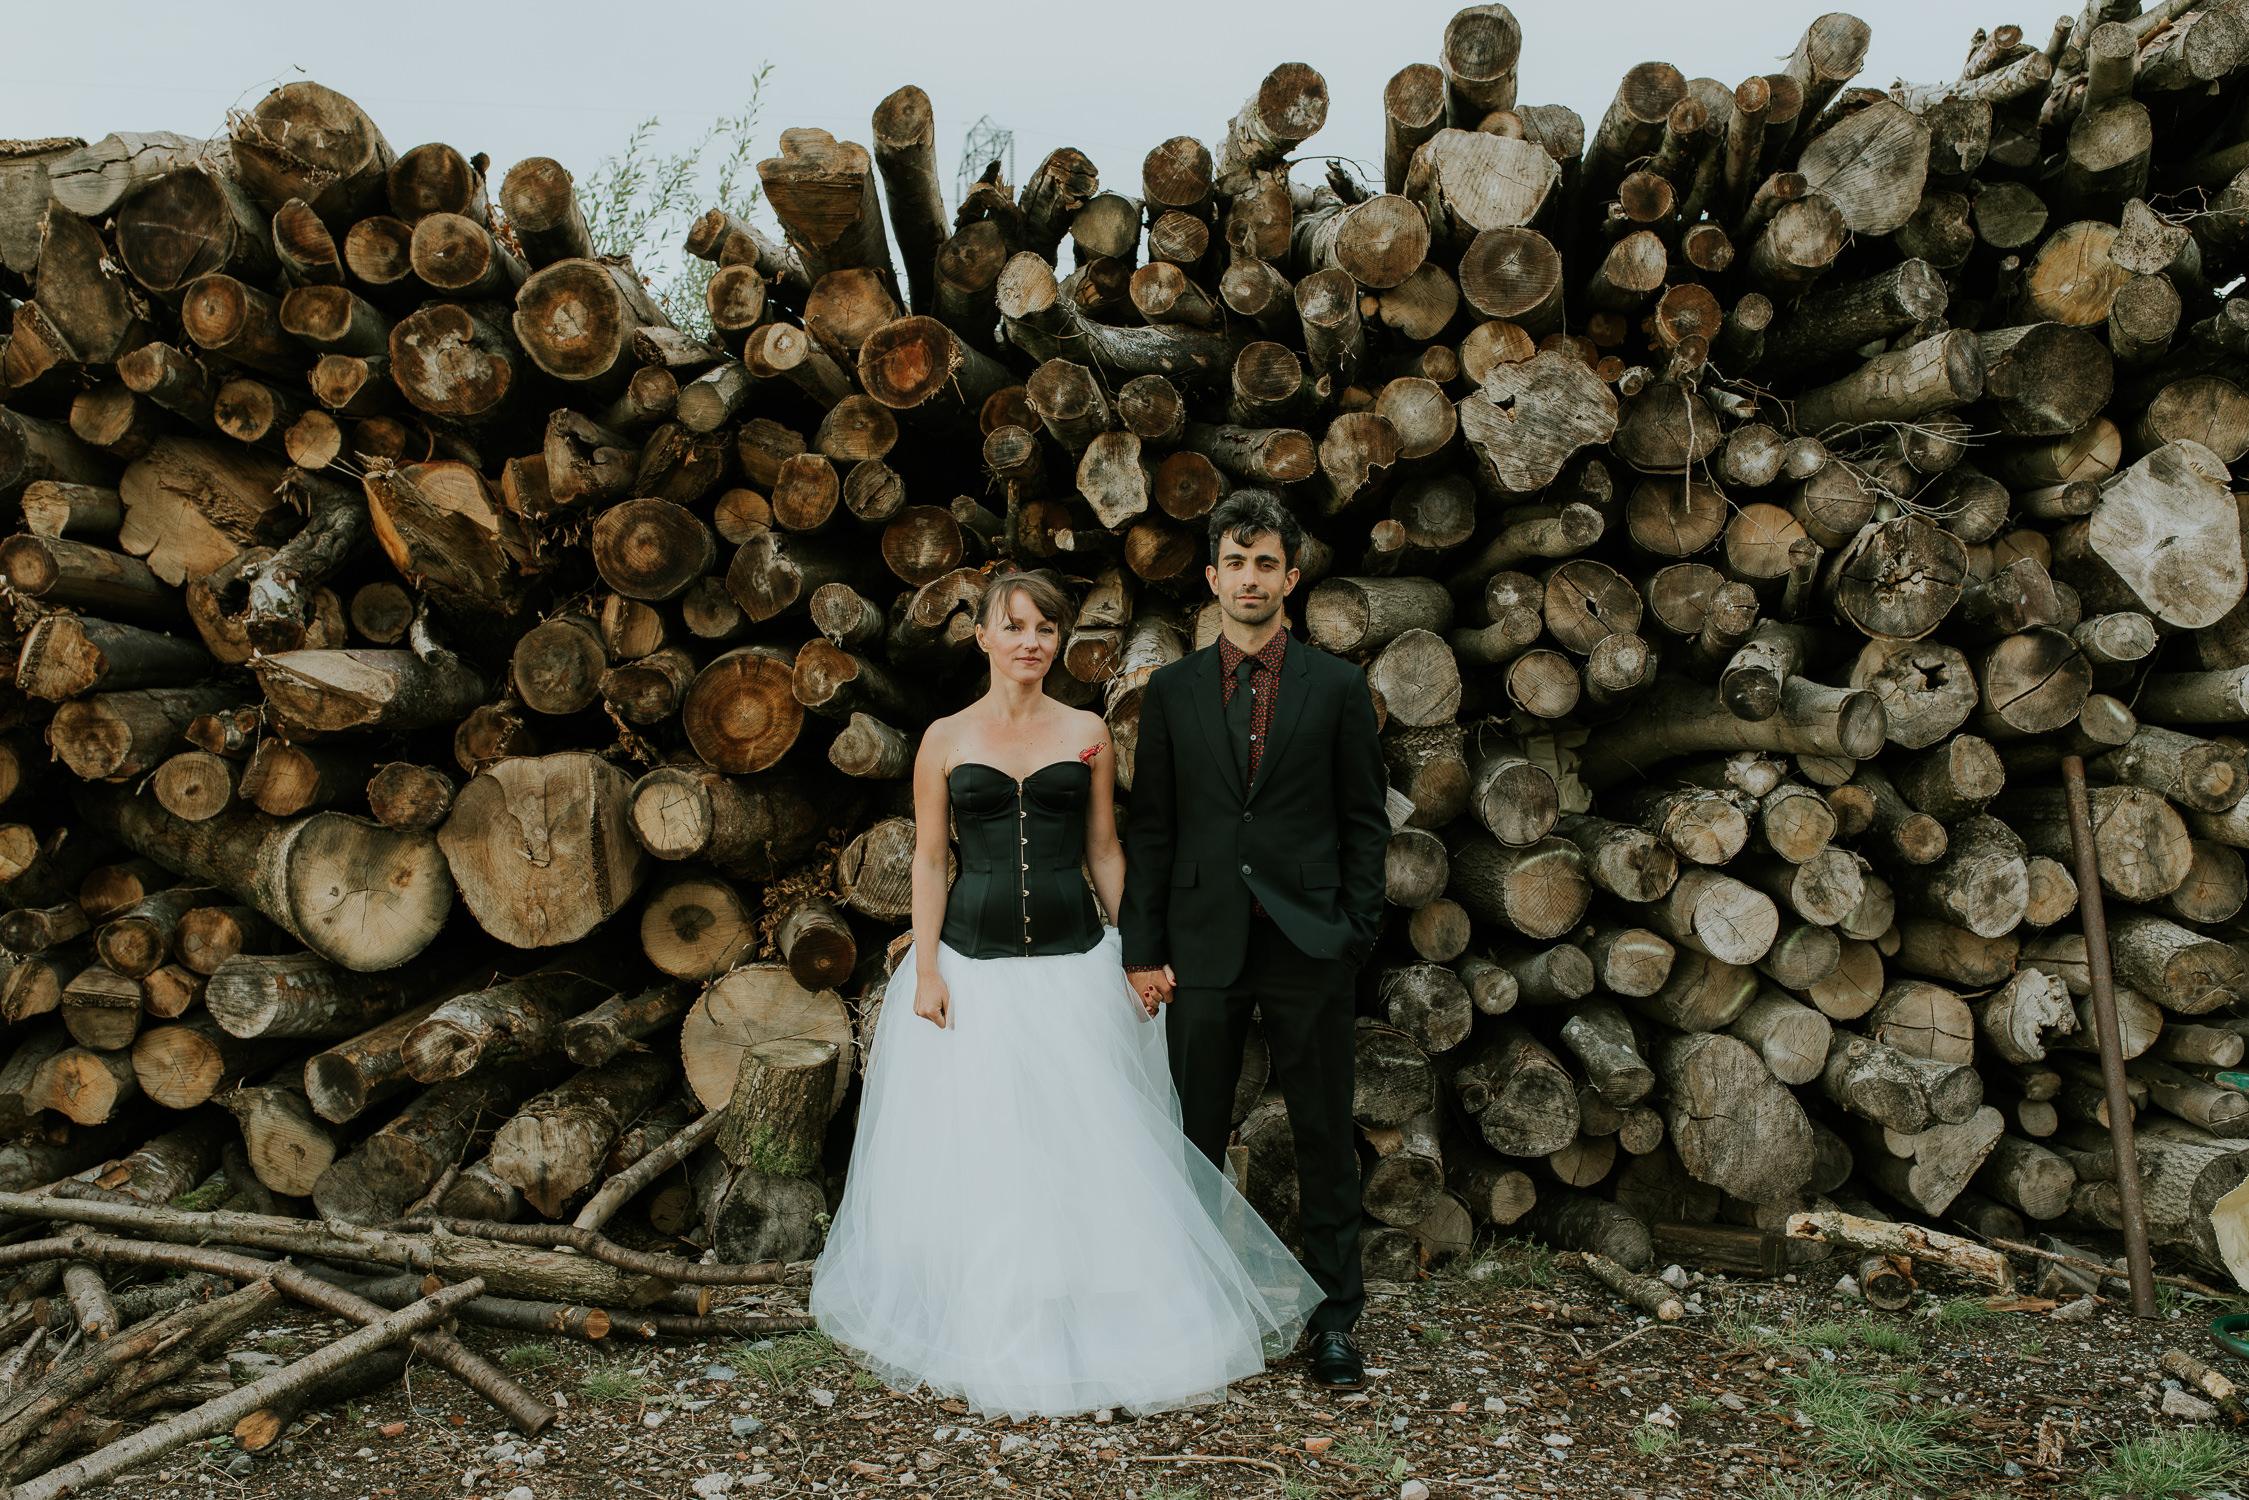 best wedding photographers 2018 mark hadden amsterdam utrecht netherlands